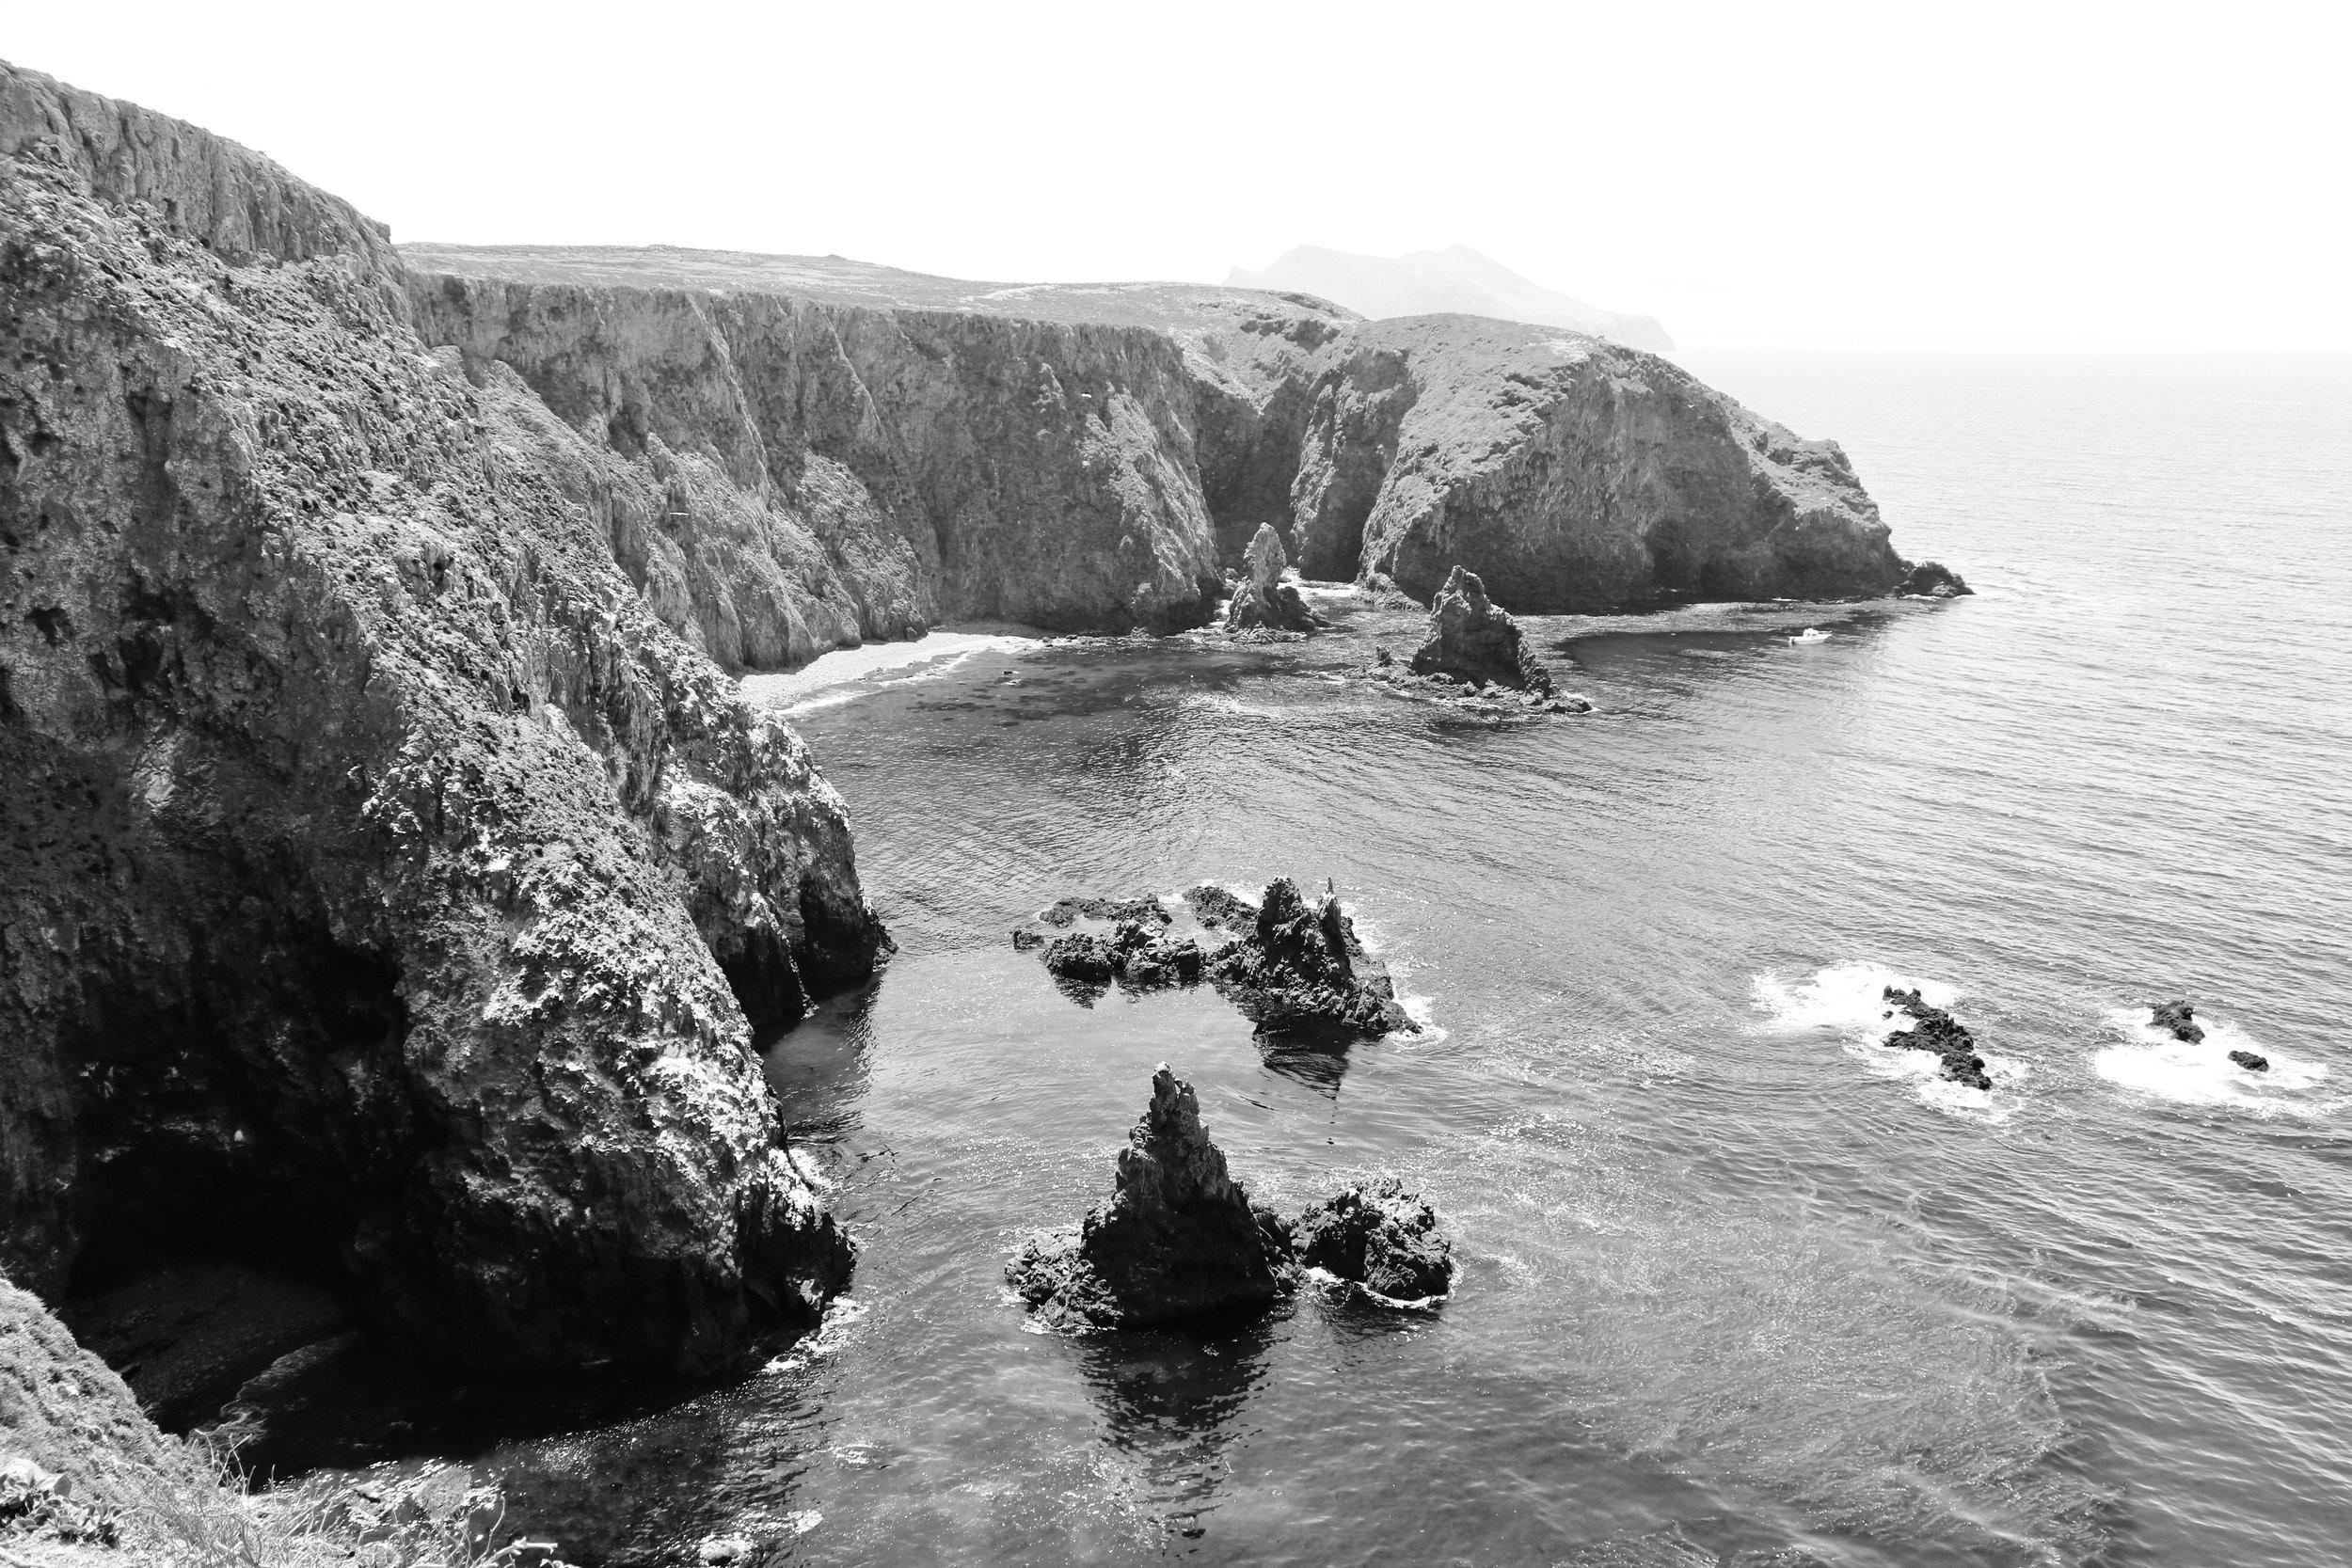 The Cove - anancapa Island, Channel Islands